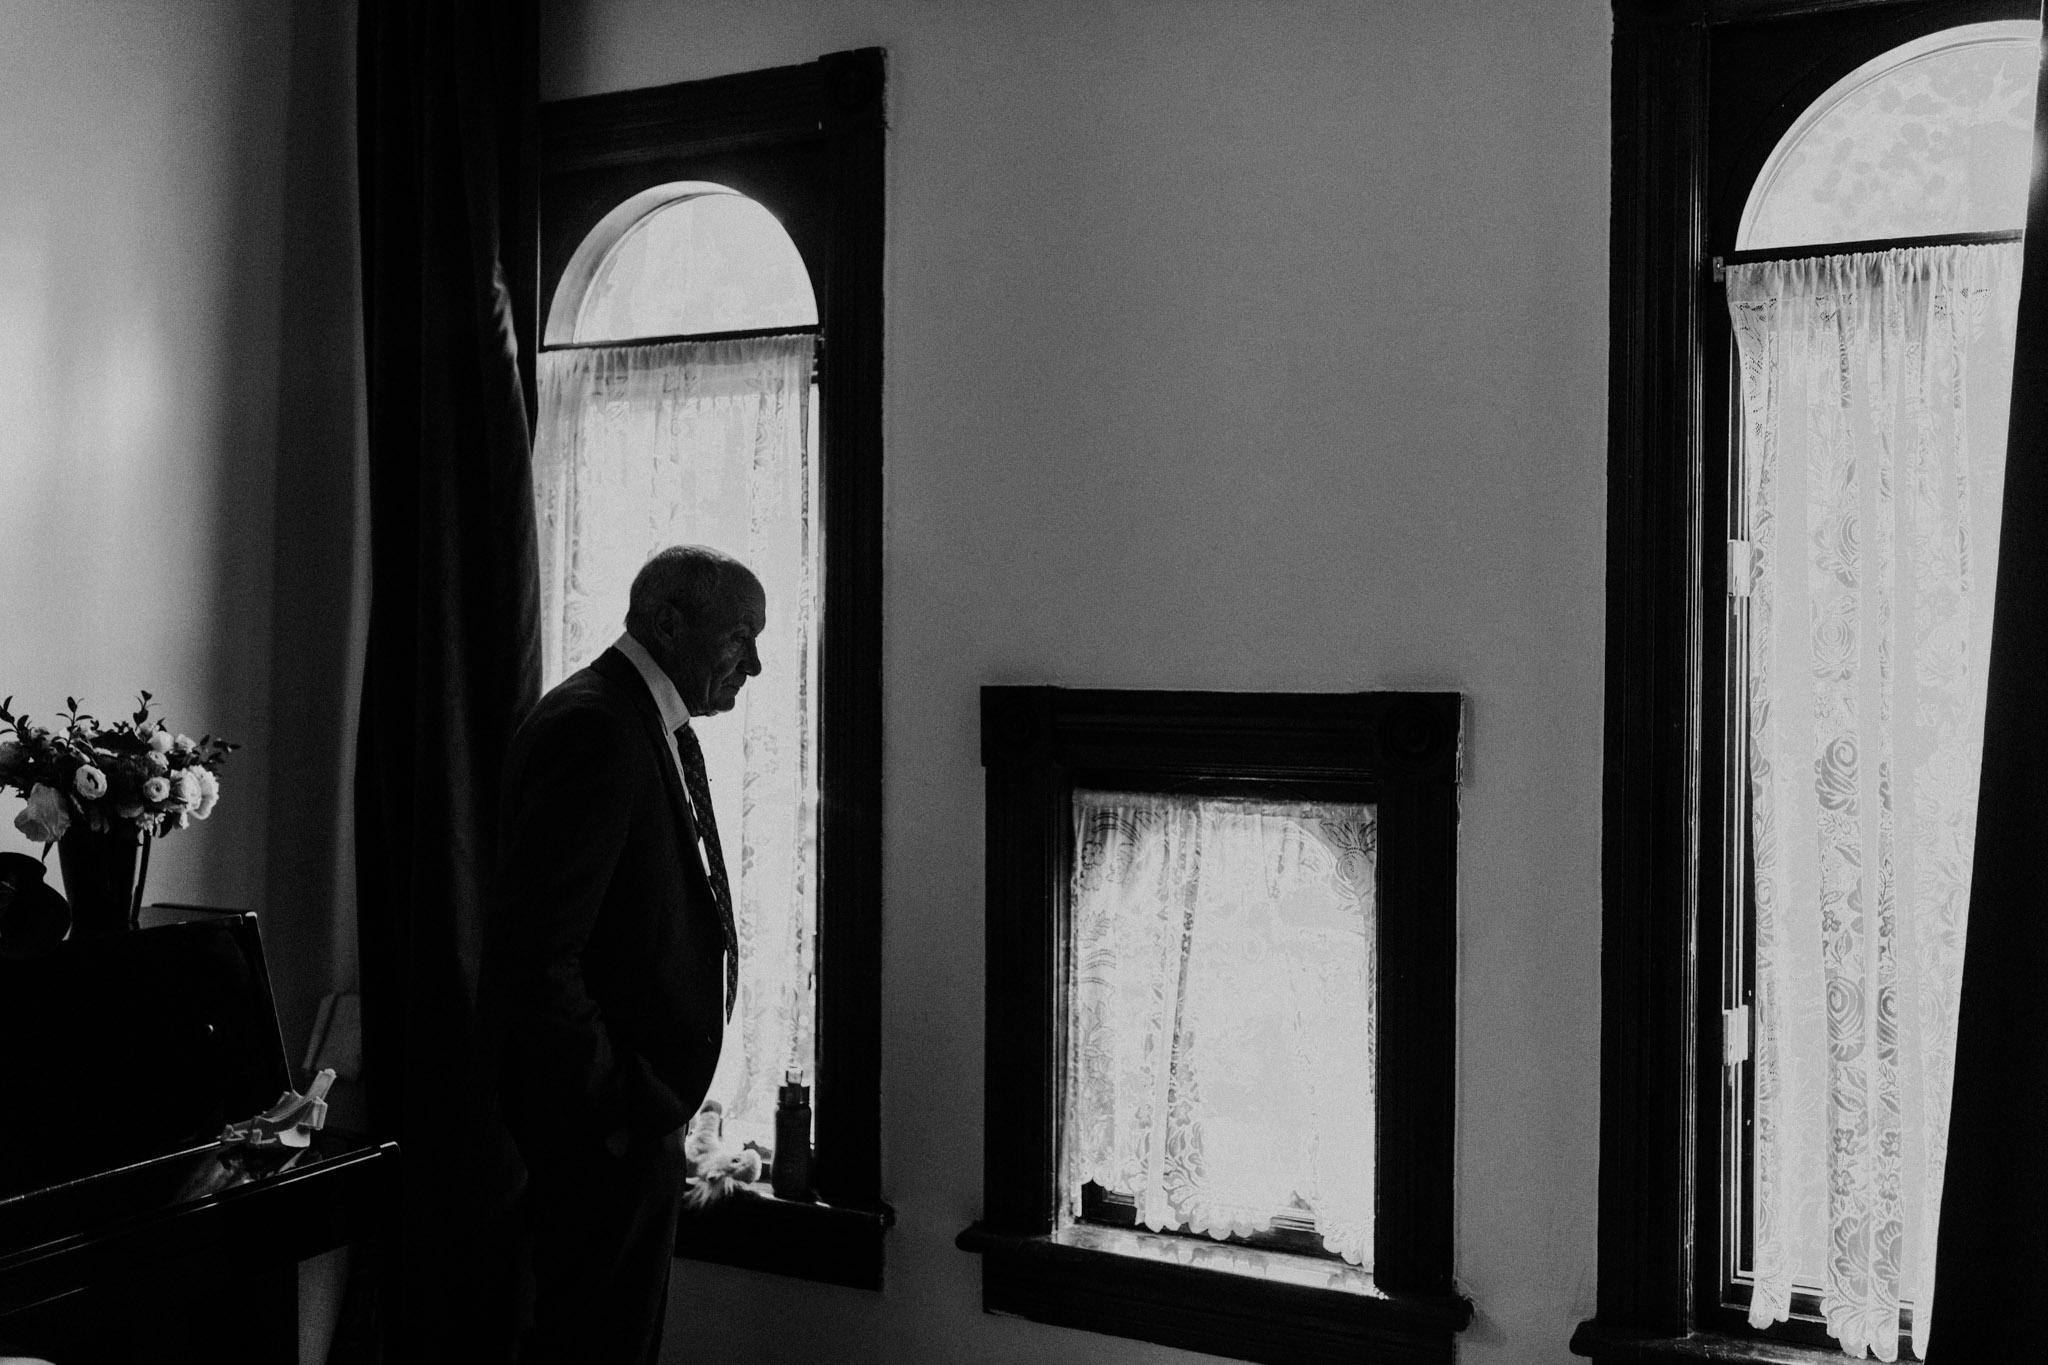 Casa La Palma Wedding - documentary wedding photography - silhouette of father in window